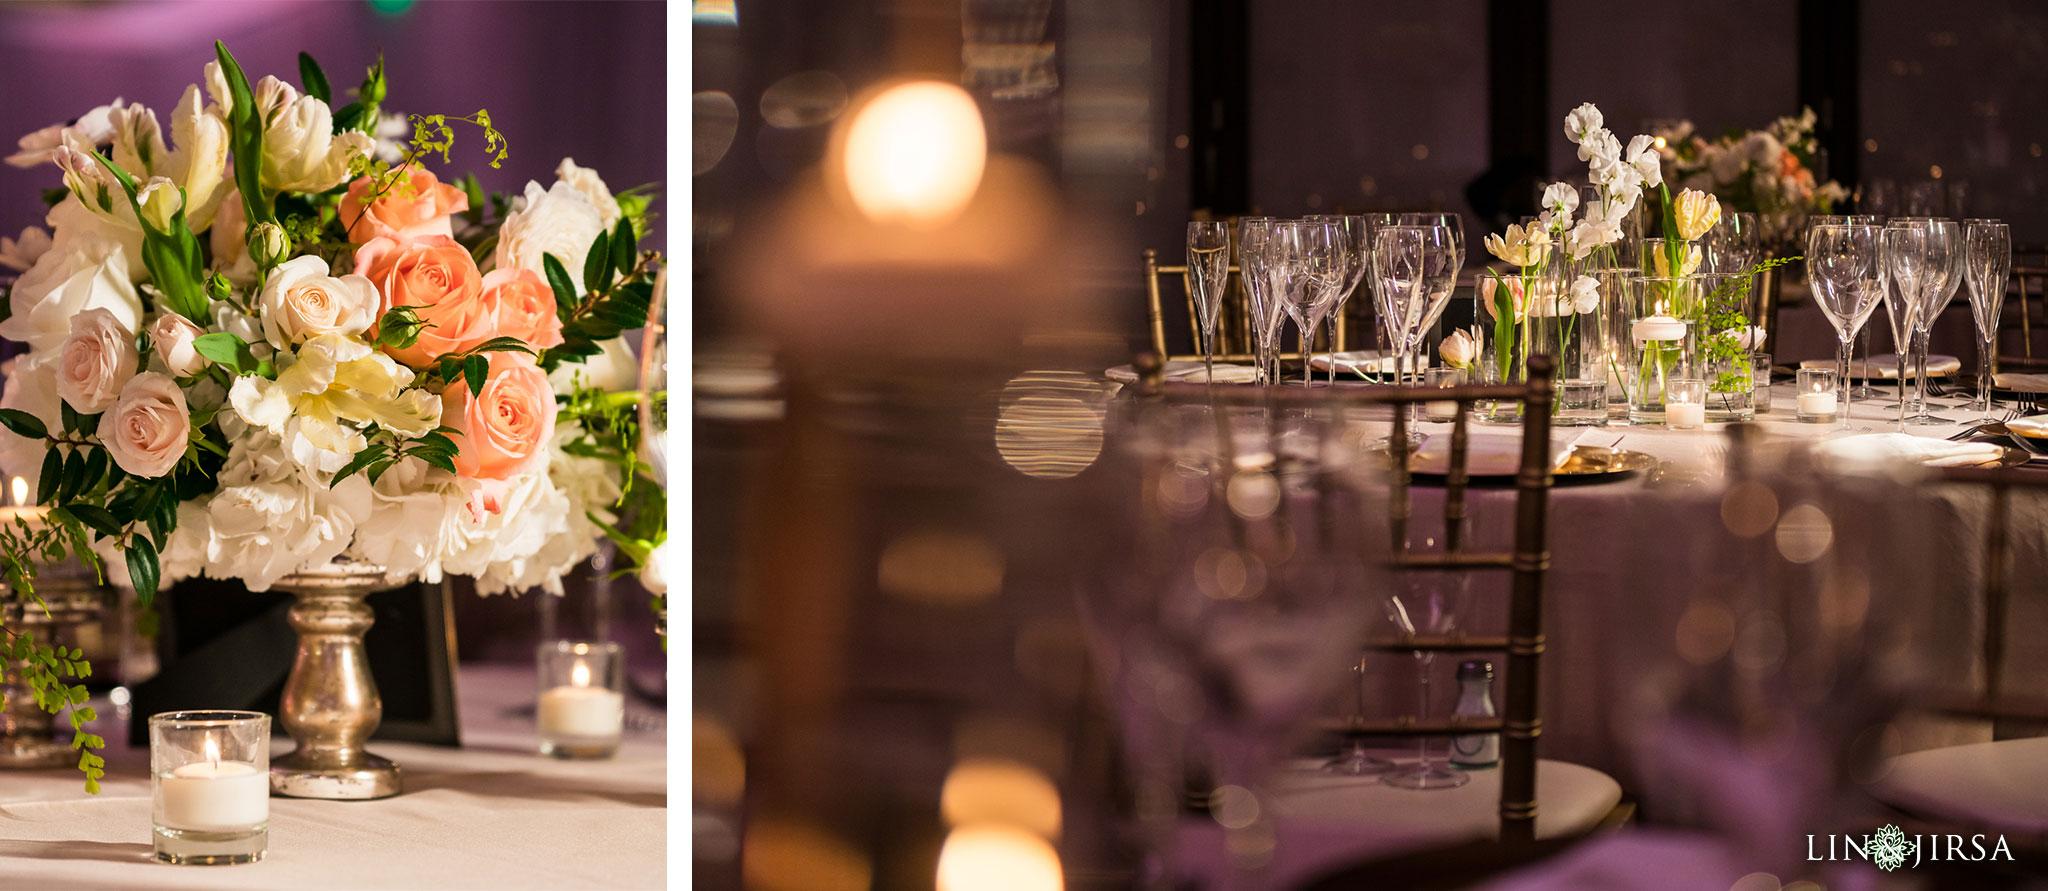 40 pasea hotel and spa huntington beach indian wedding reception photography